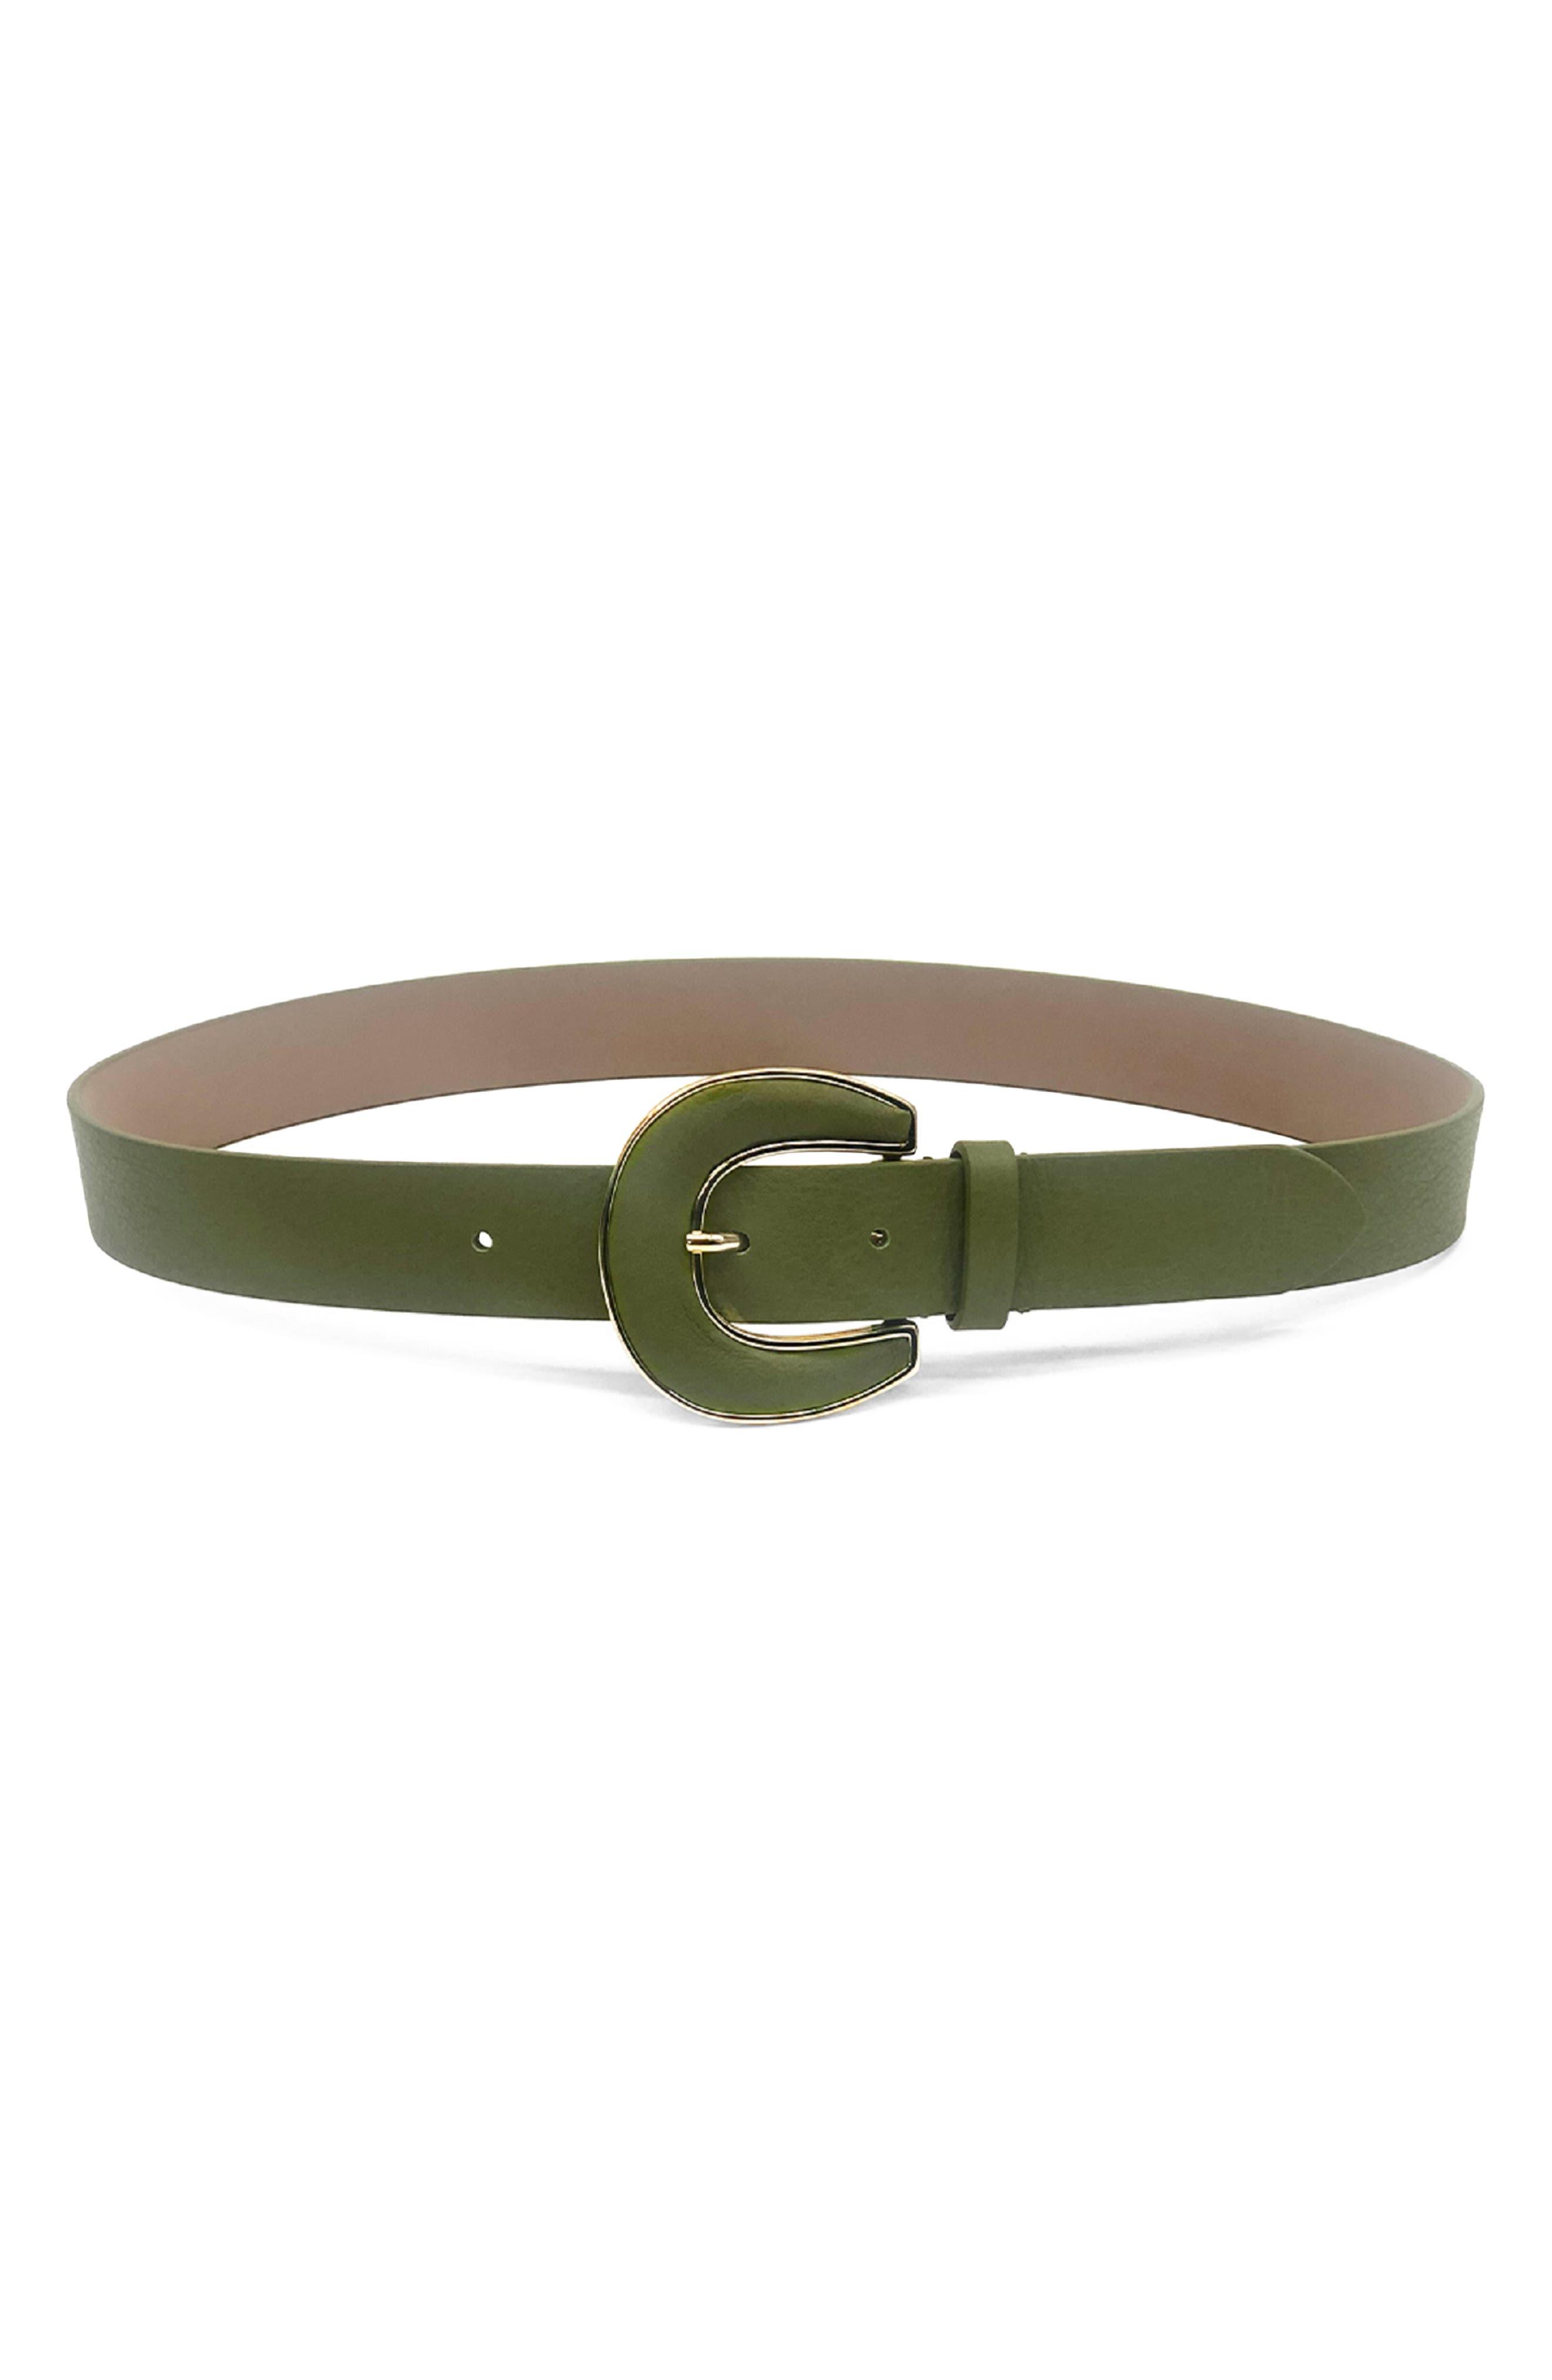 Palmer Belt